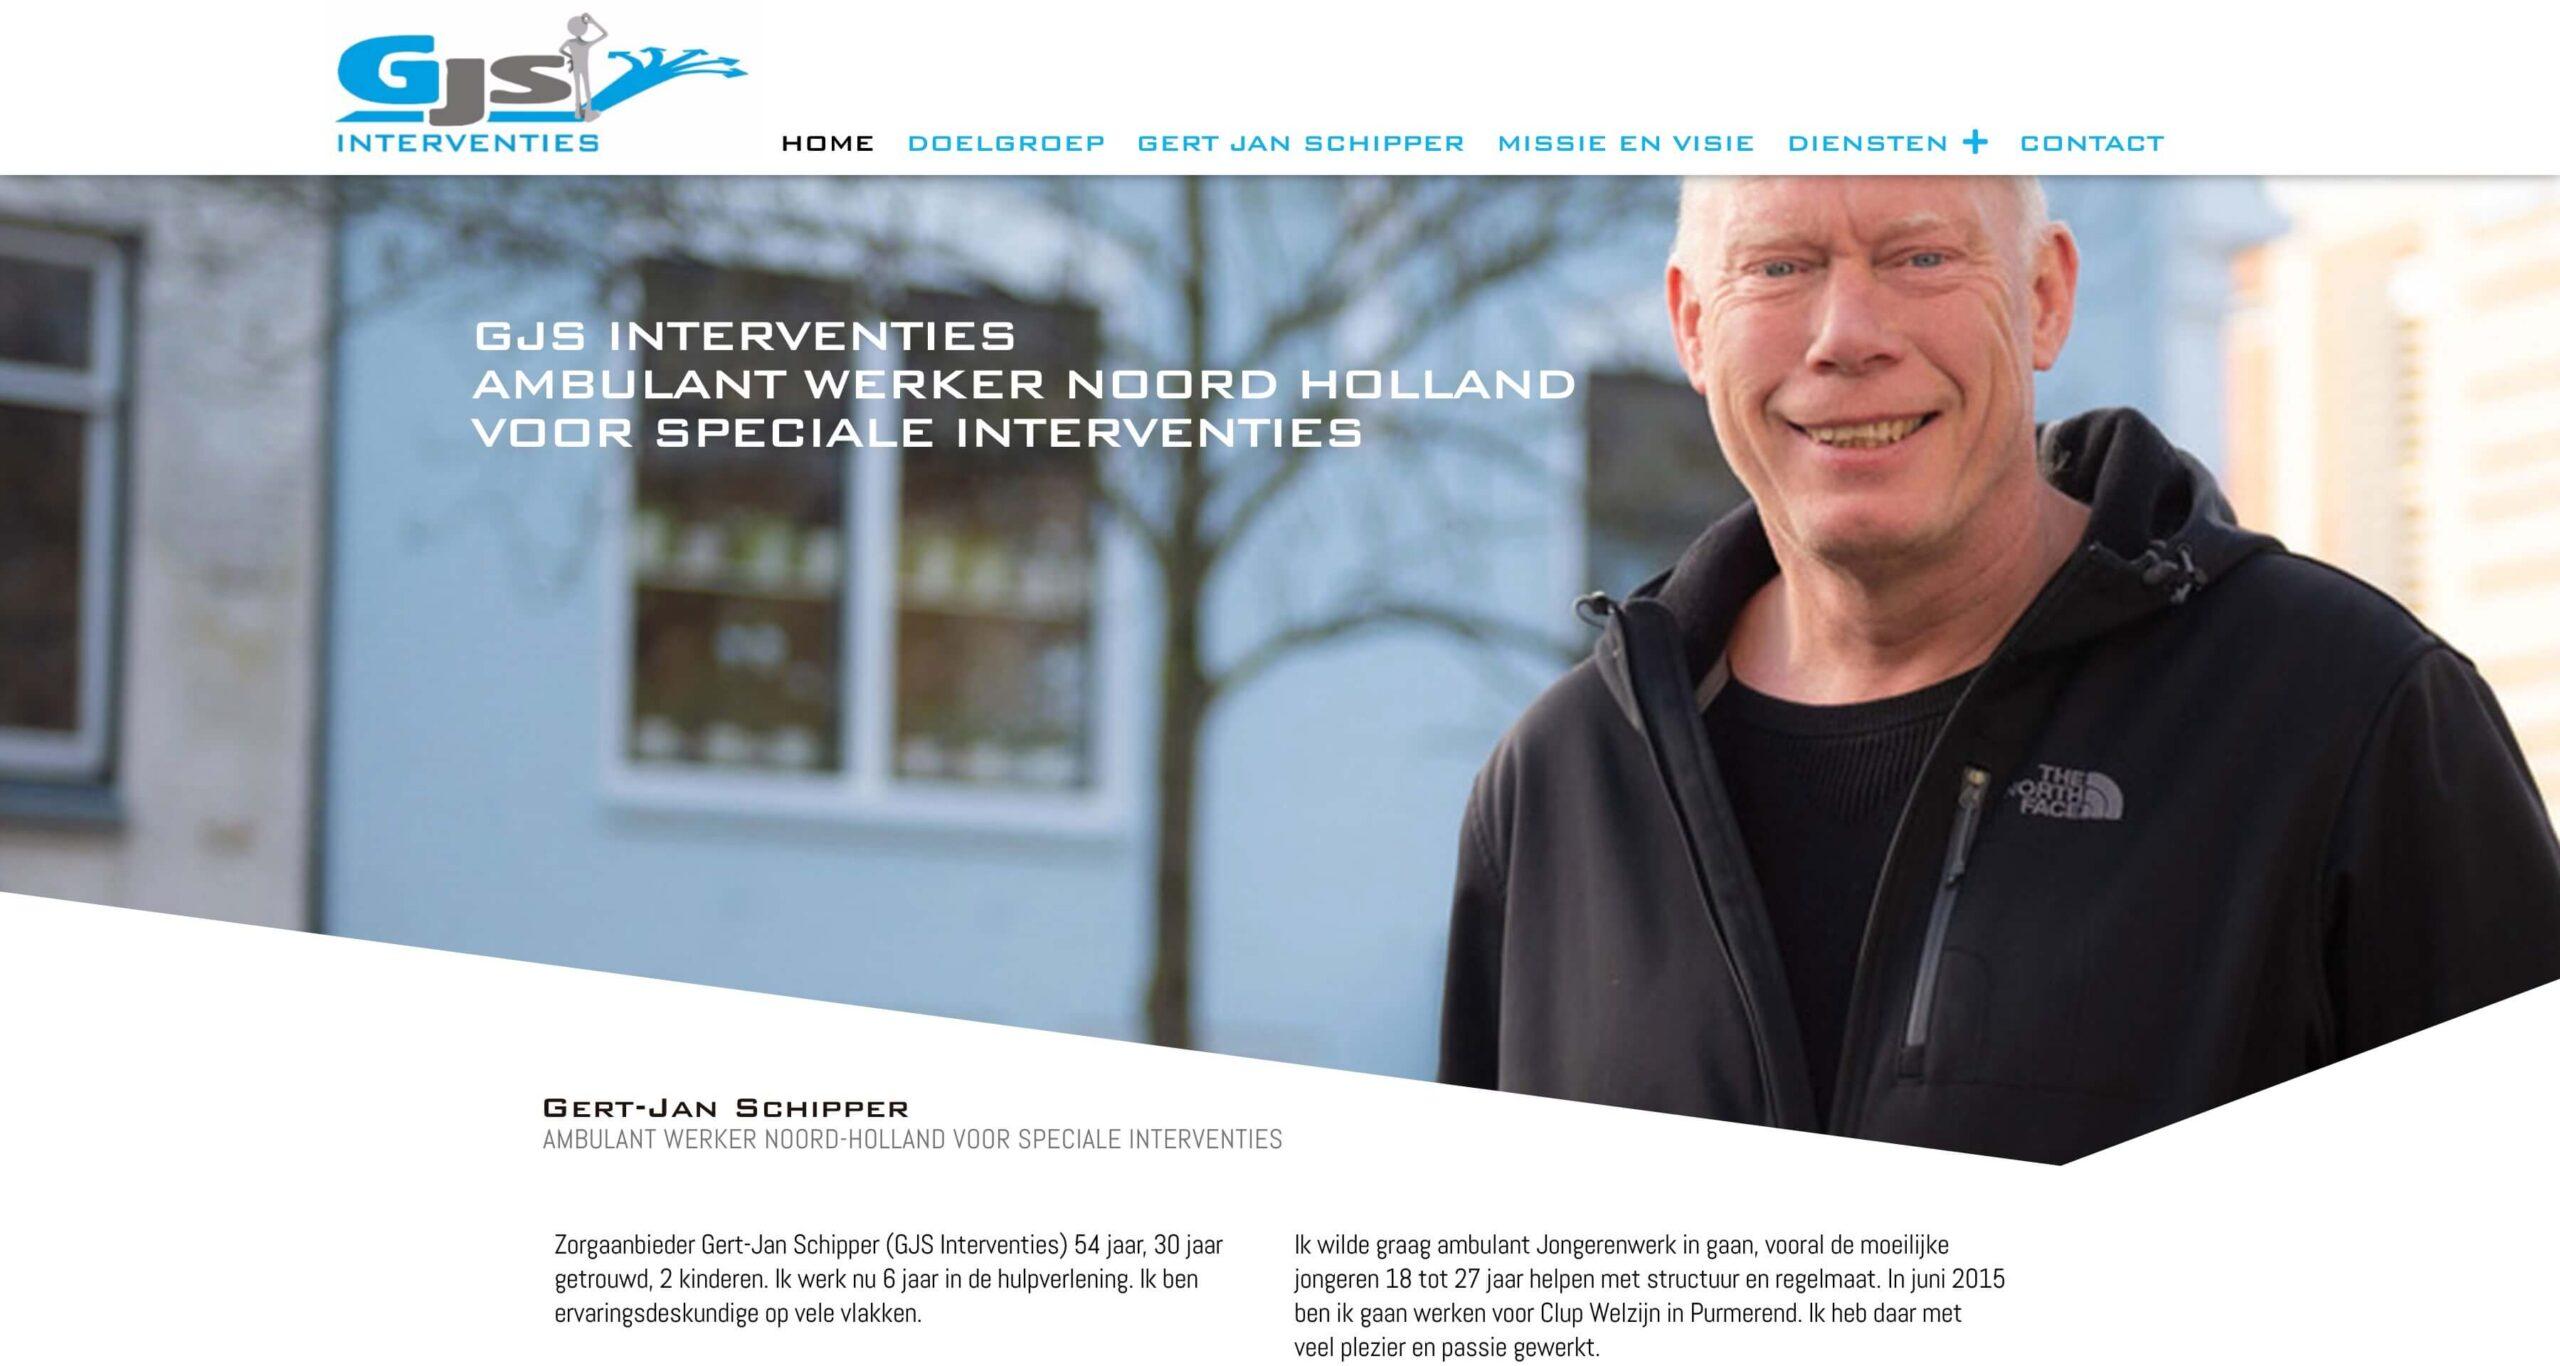 GJS Interventies - Speciale Interventies - gjsinterventies.nl